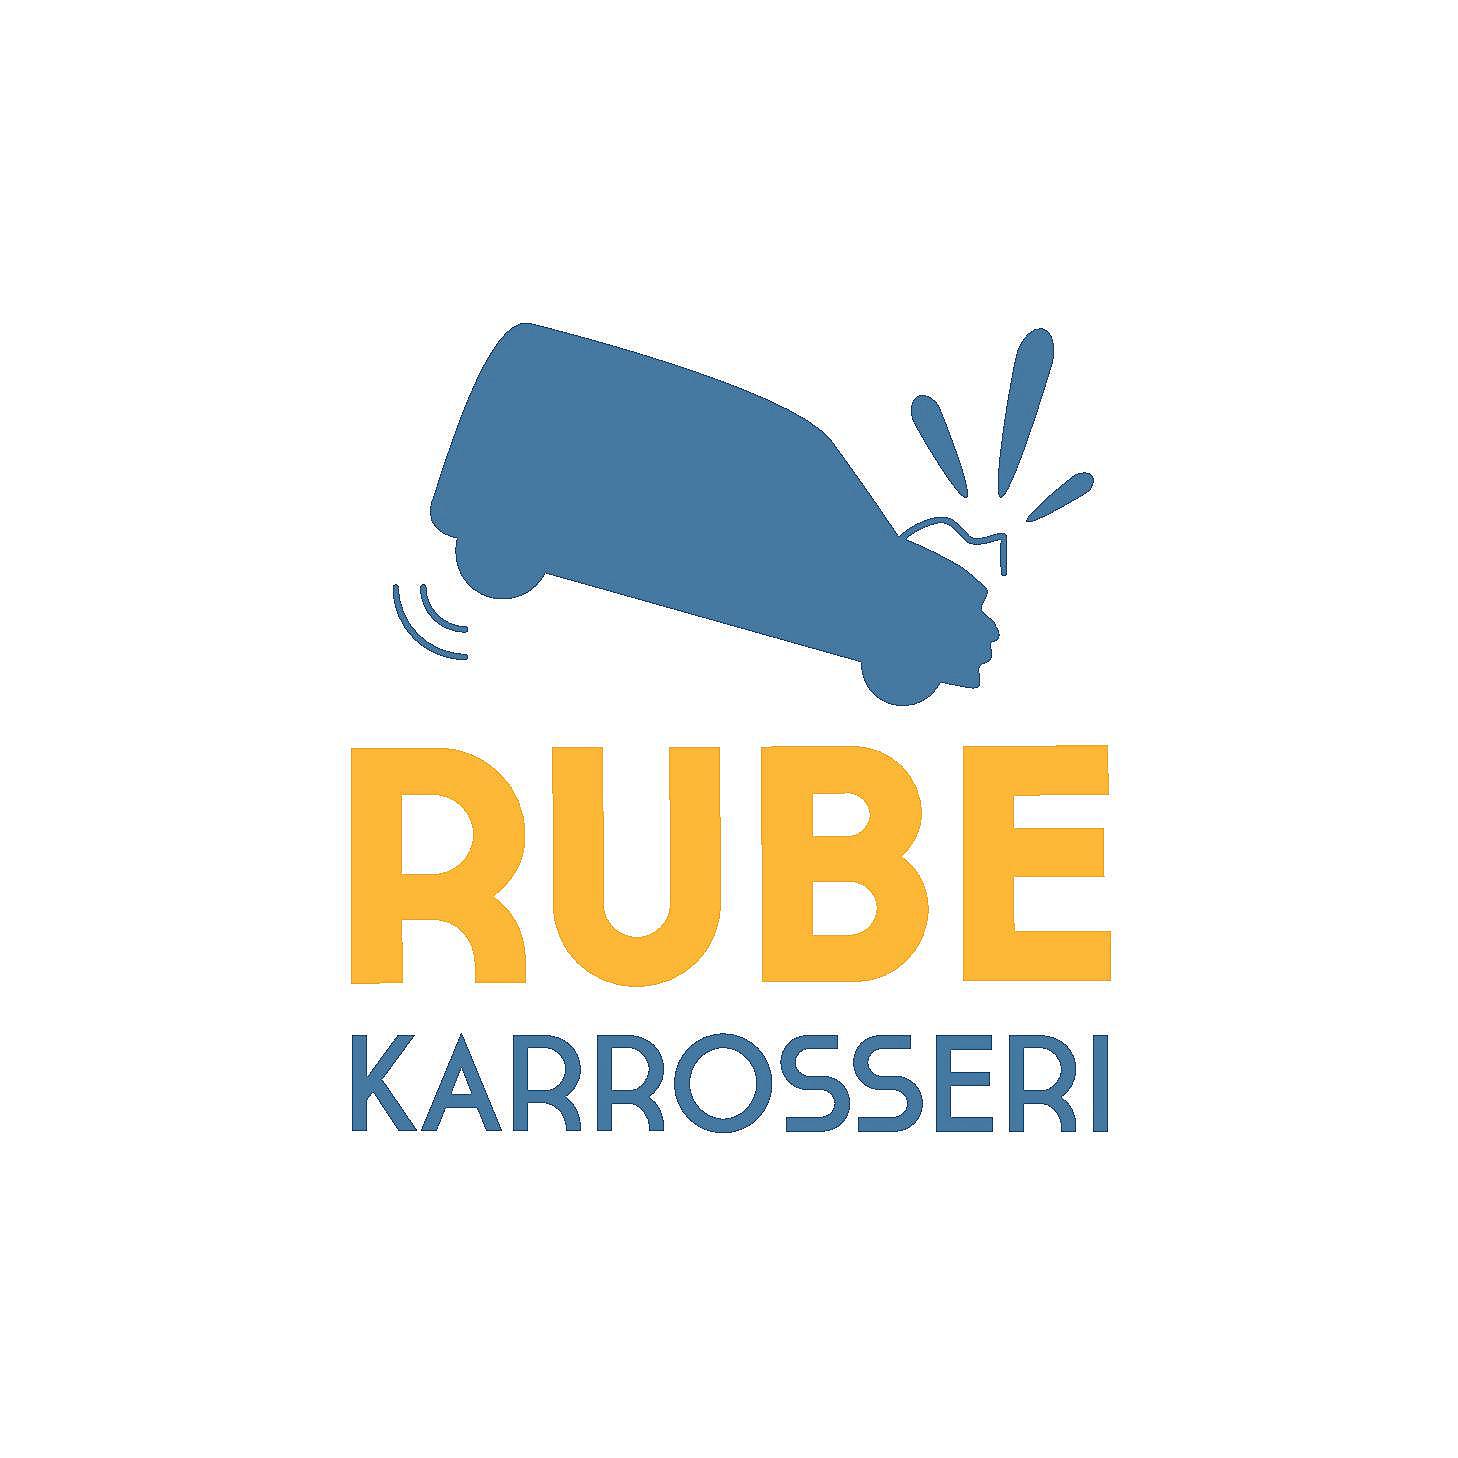 LogoKvadrat-RUBE-Karosseri_01